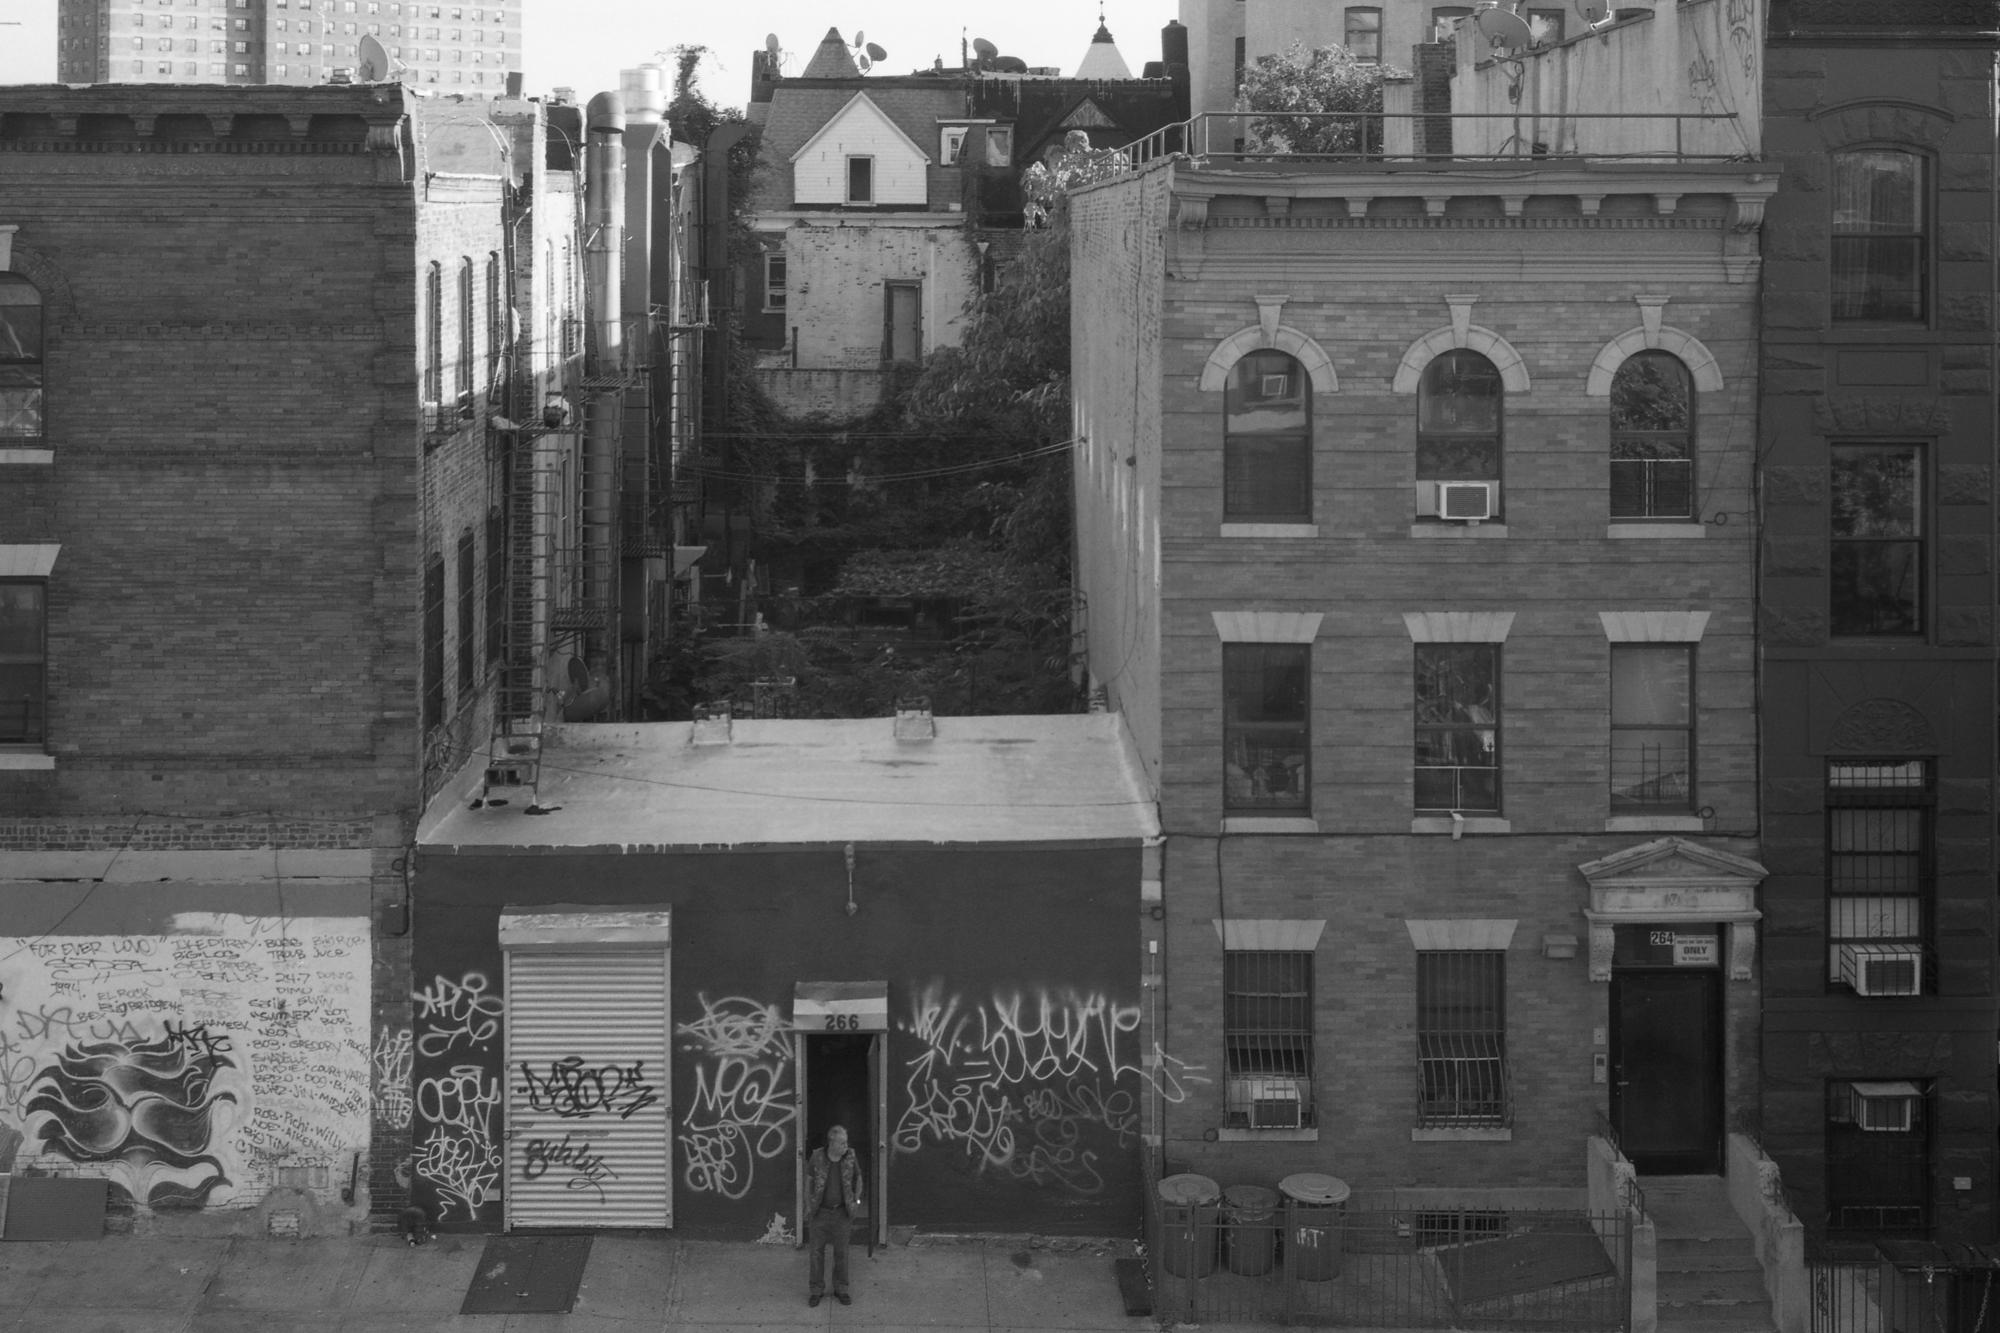 NYC_35mm_00035.jpg